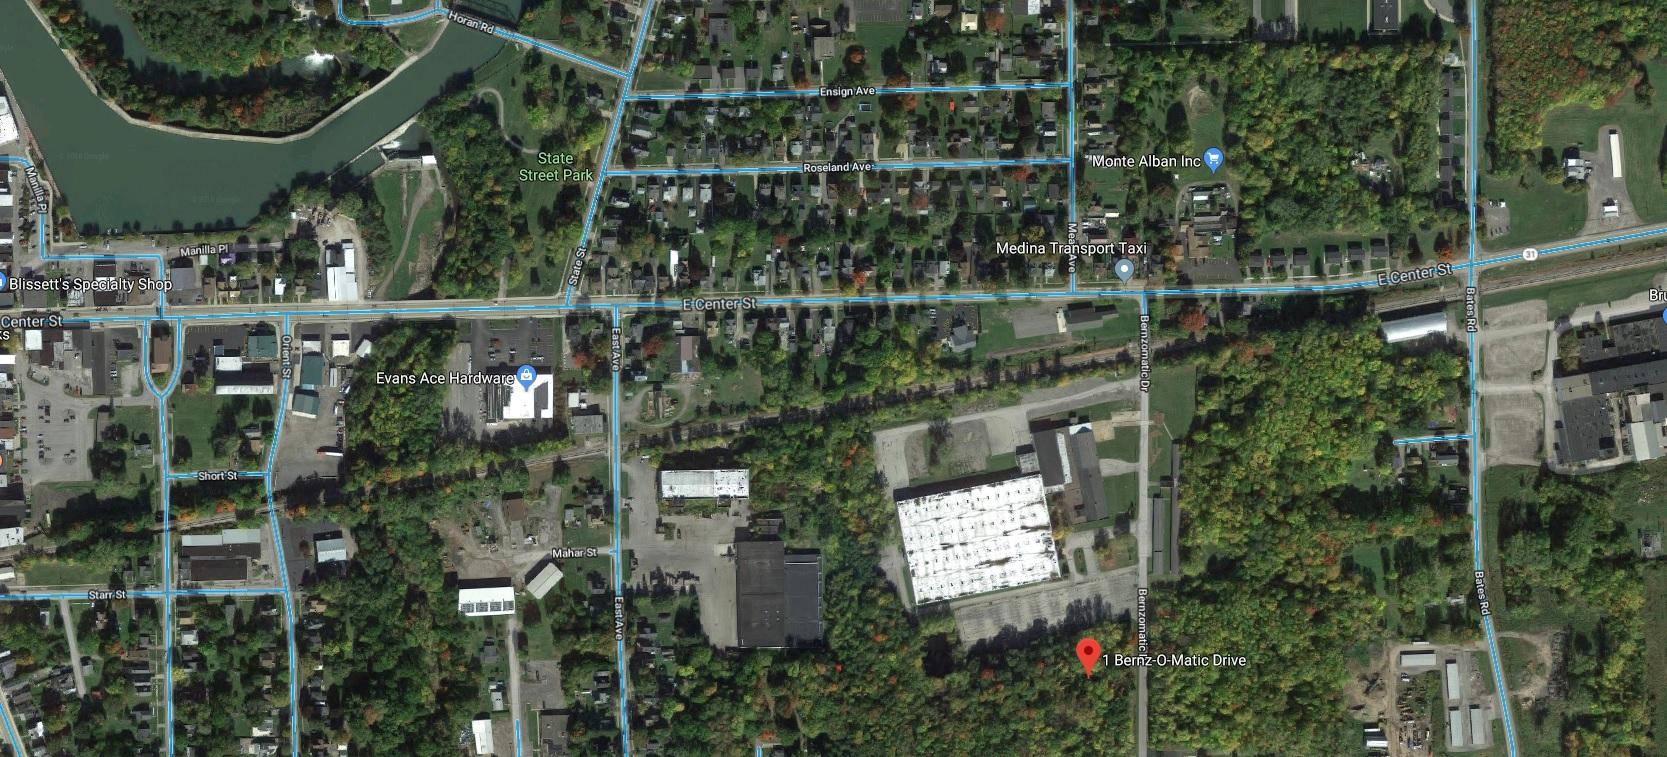 Middleport businessman buys Medina manufacturing facility